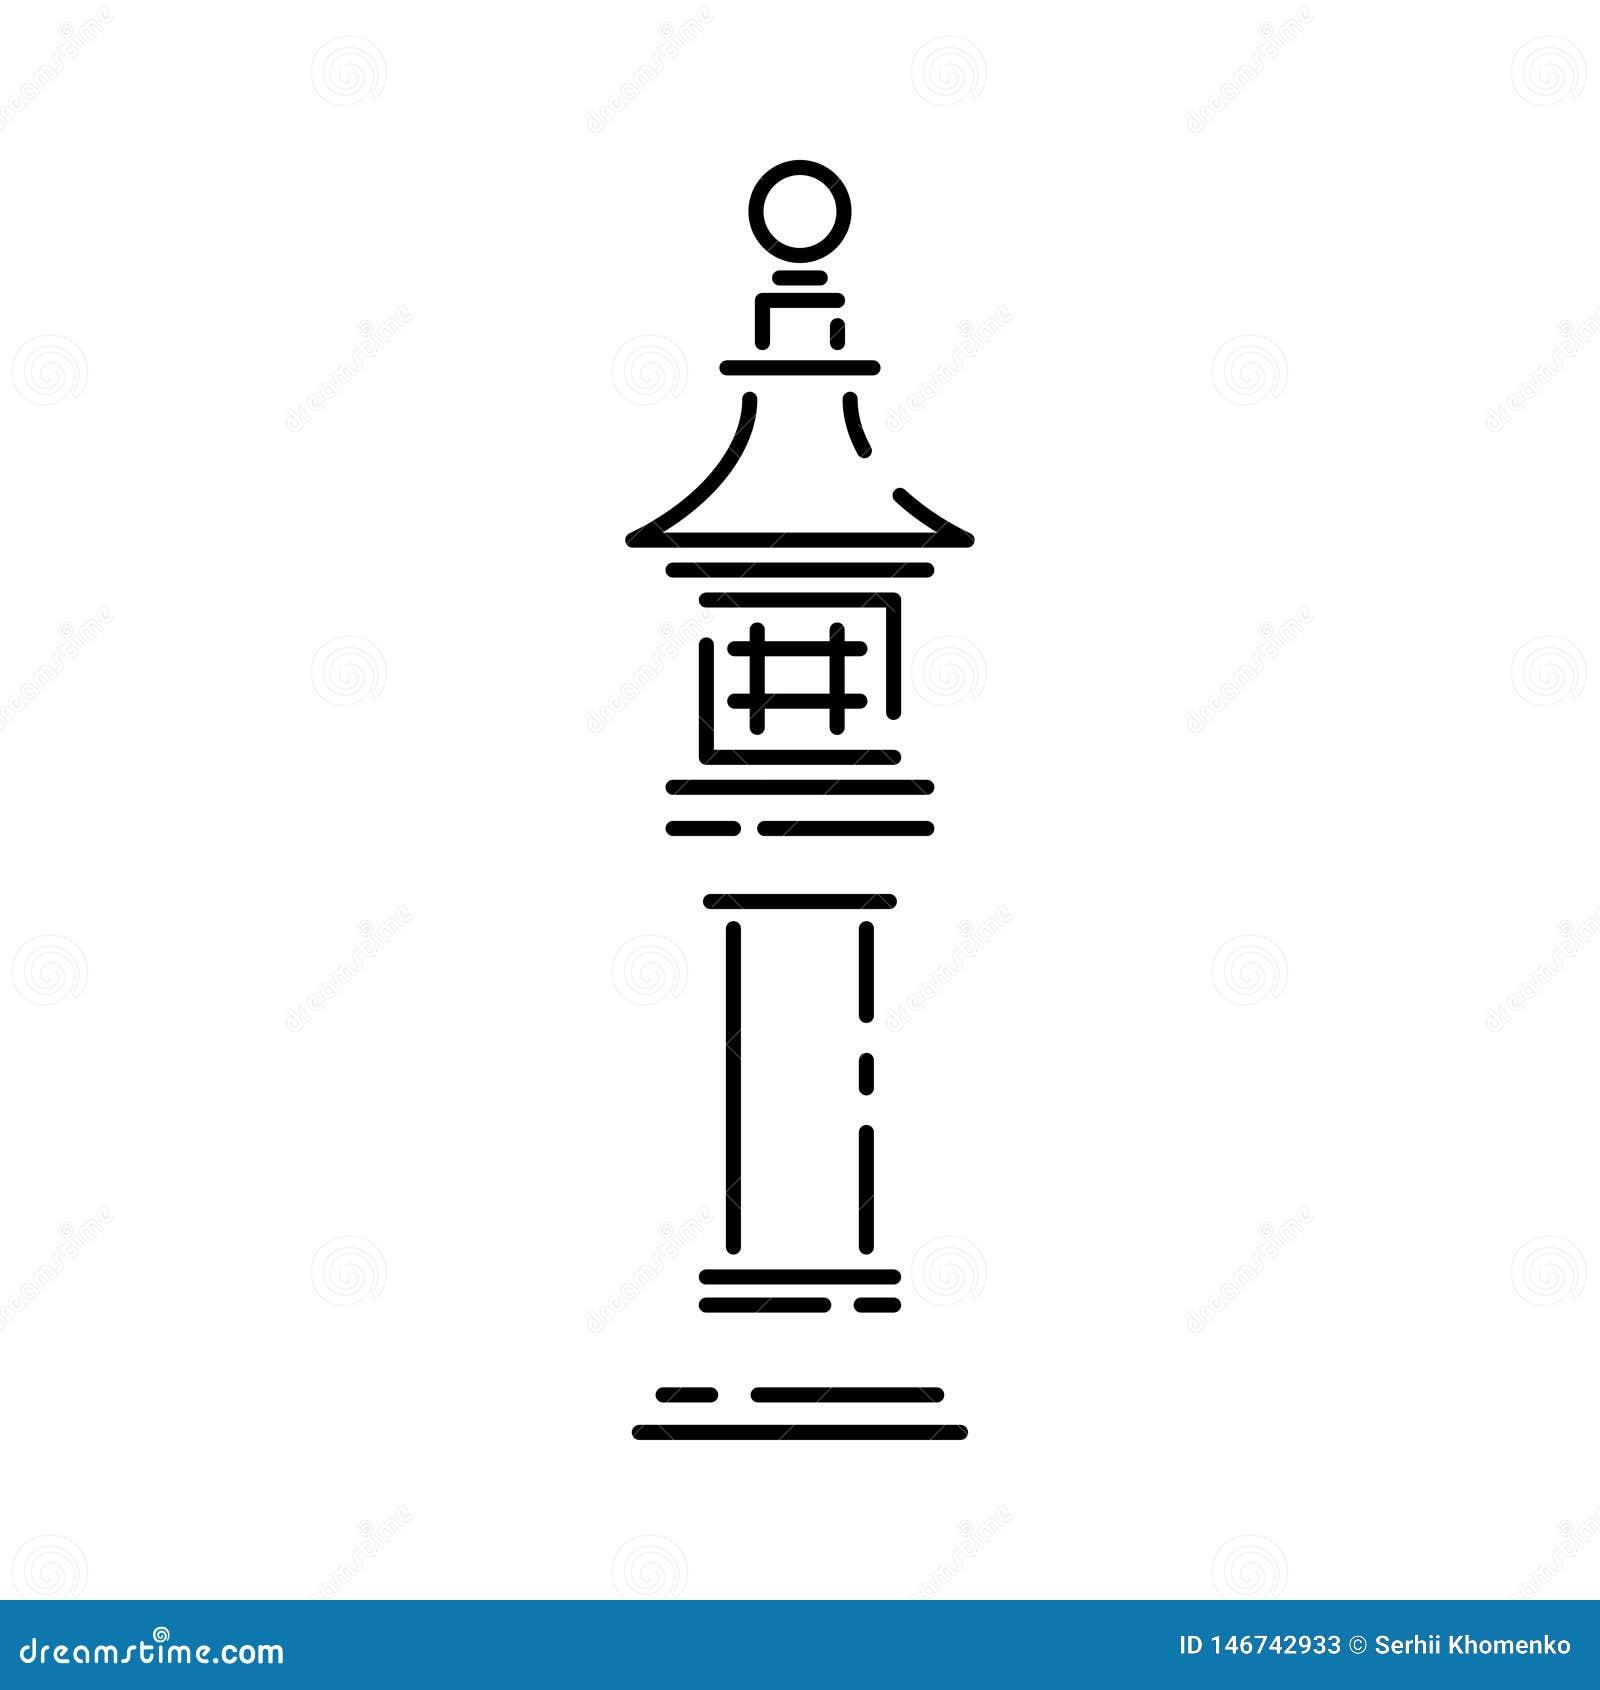 Japan landmark - temple, shrine, castle, pagoda, gate vector illustration simplified travel icon. Chinese, asian